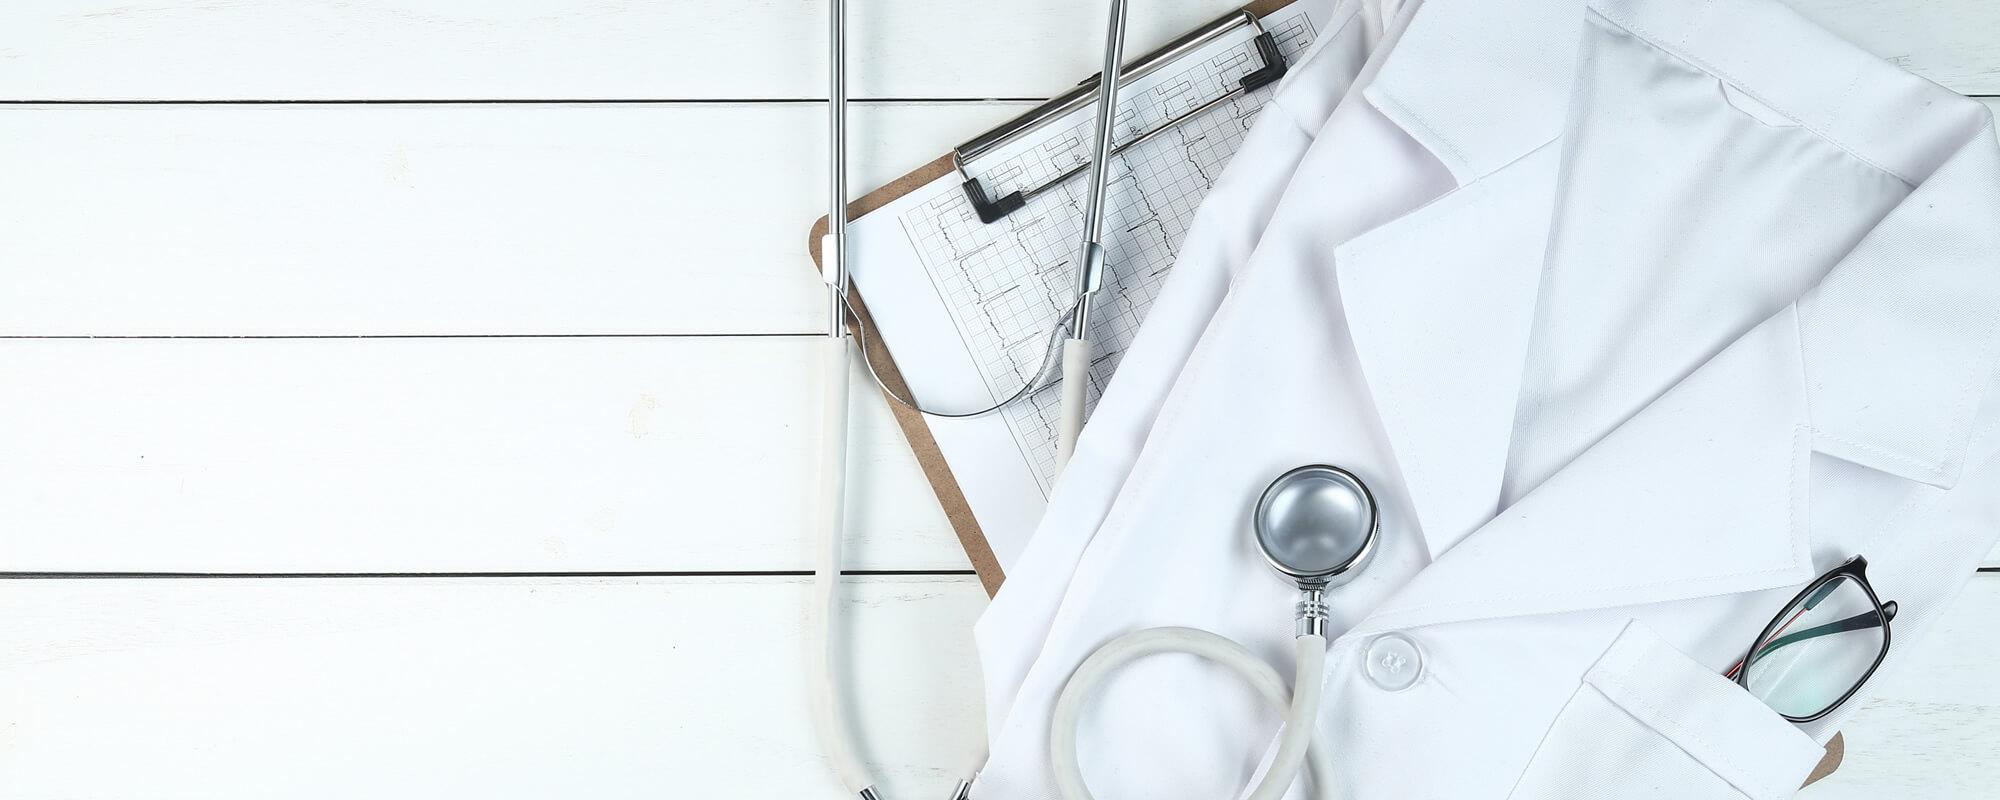 Servicii medicale de cardiologie si chirurgie cardiovasculara la <span>Standarde Europene</span>